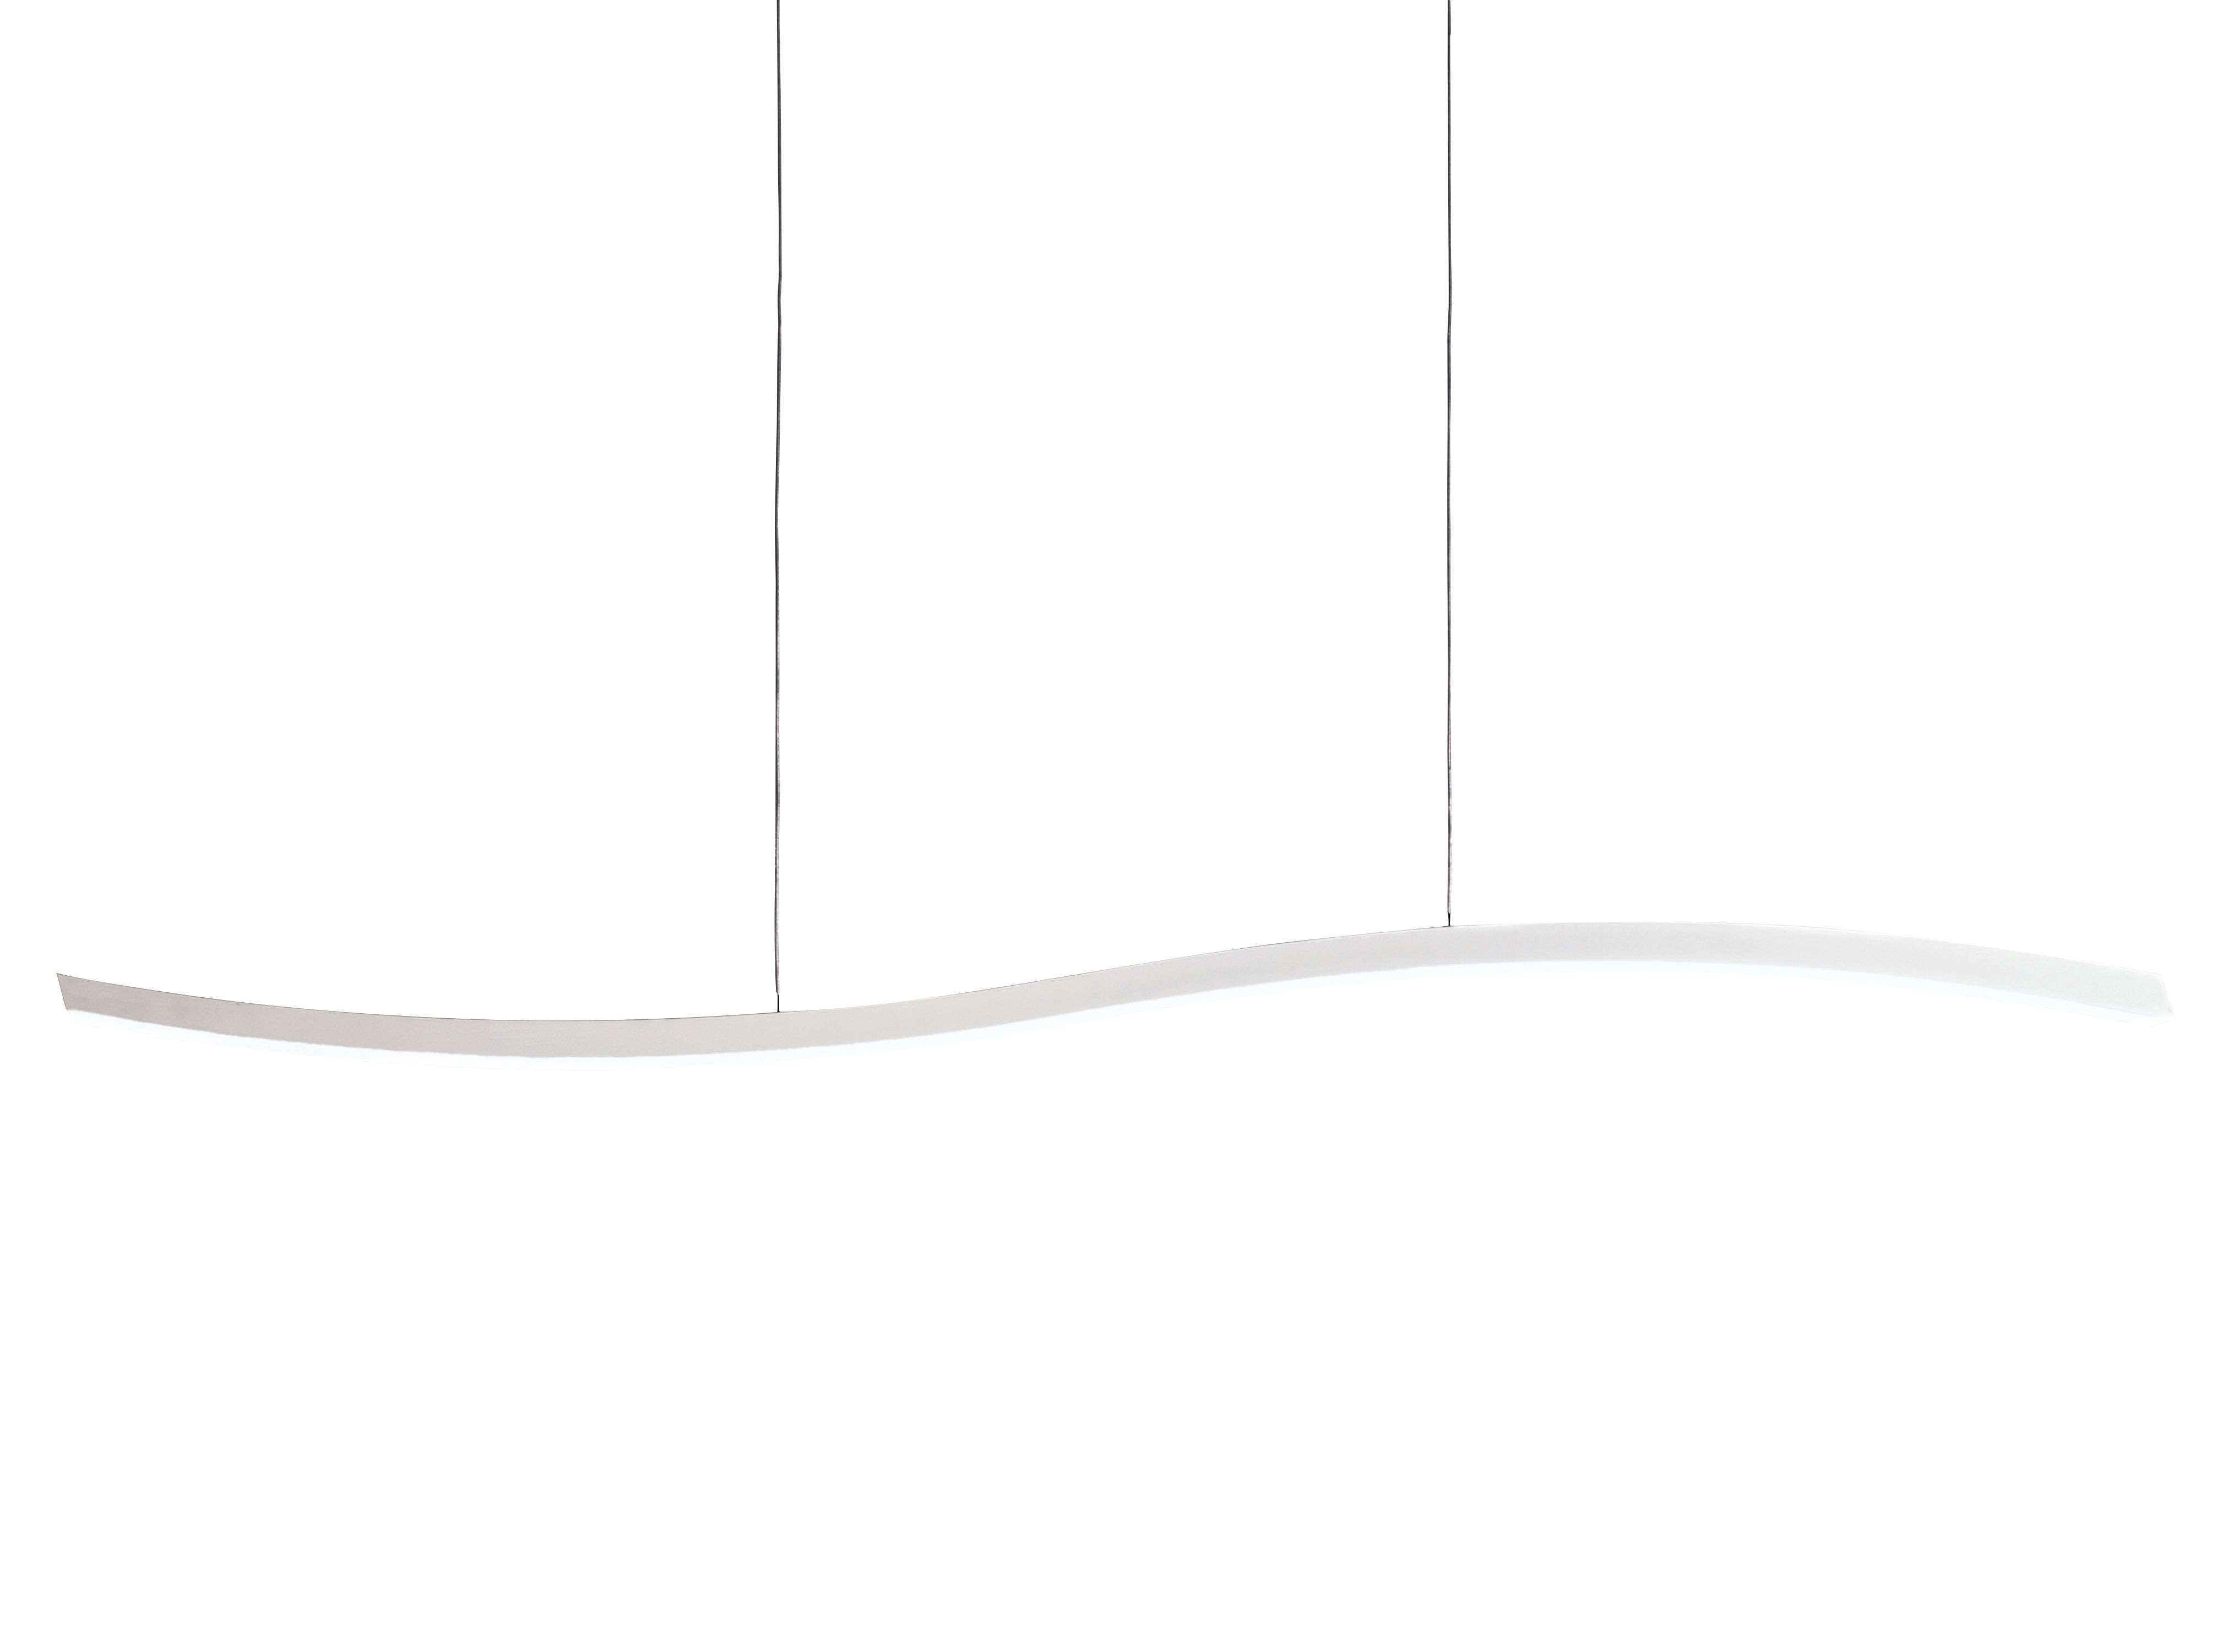 Lighting - Pendant Lighting - Serpentine Pendant - 364 Leds by Fontana Arte - White - Lacquered aluminium